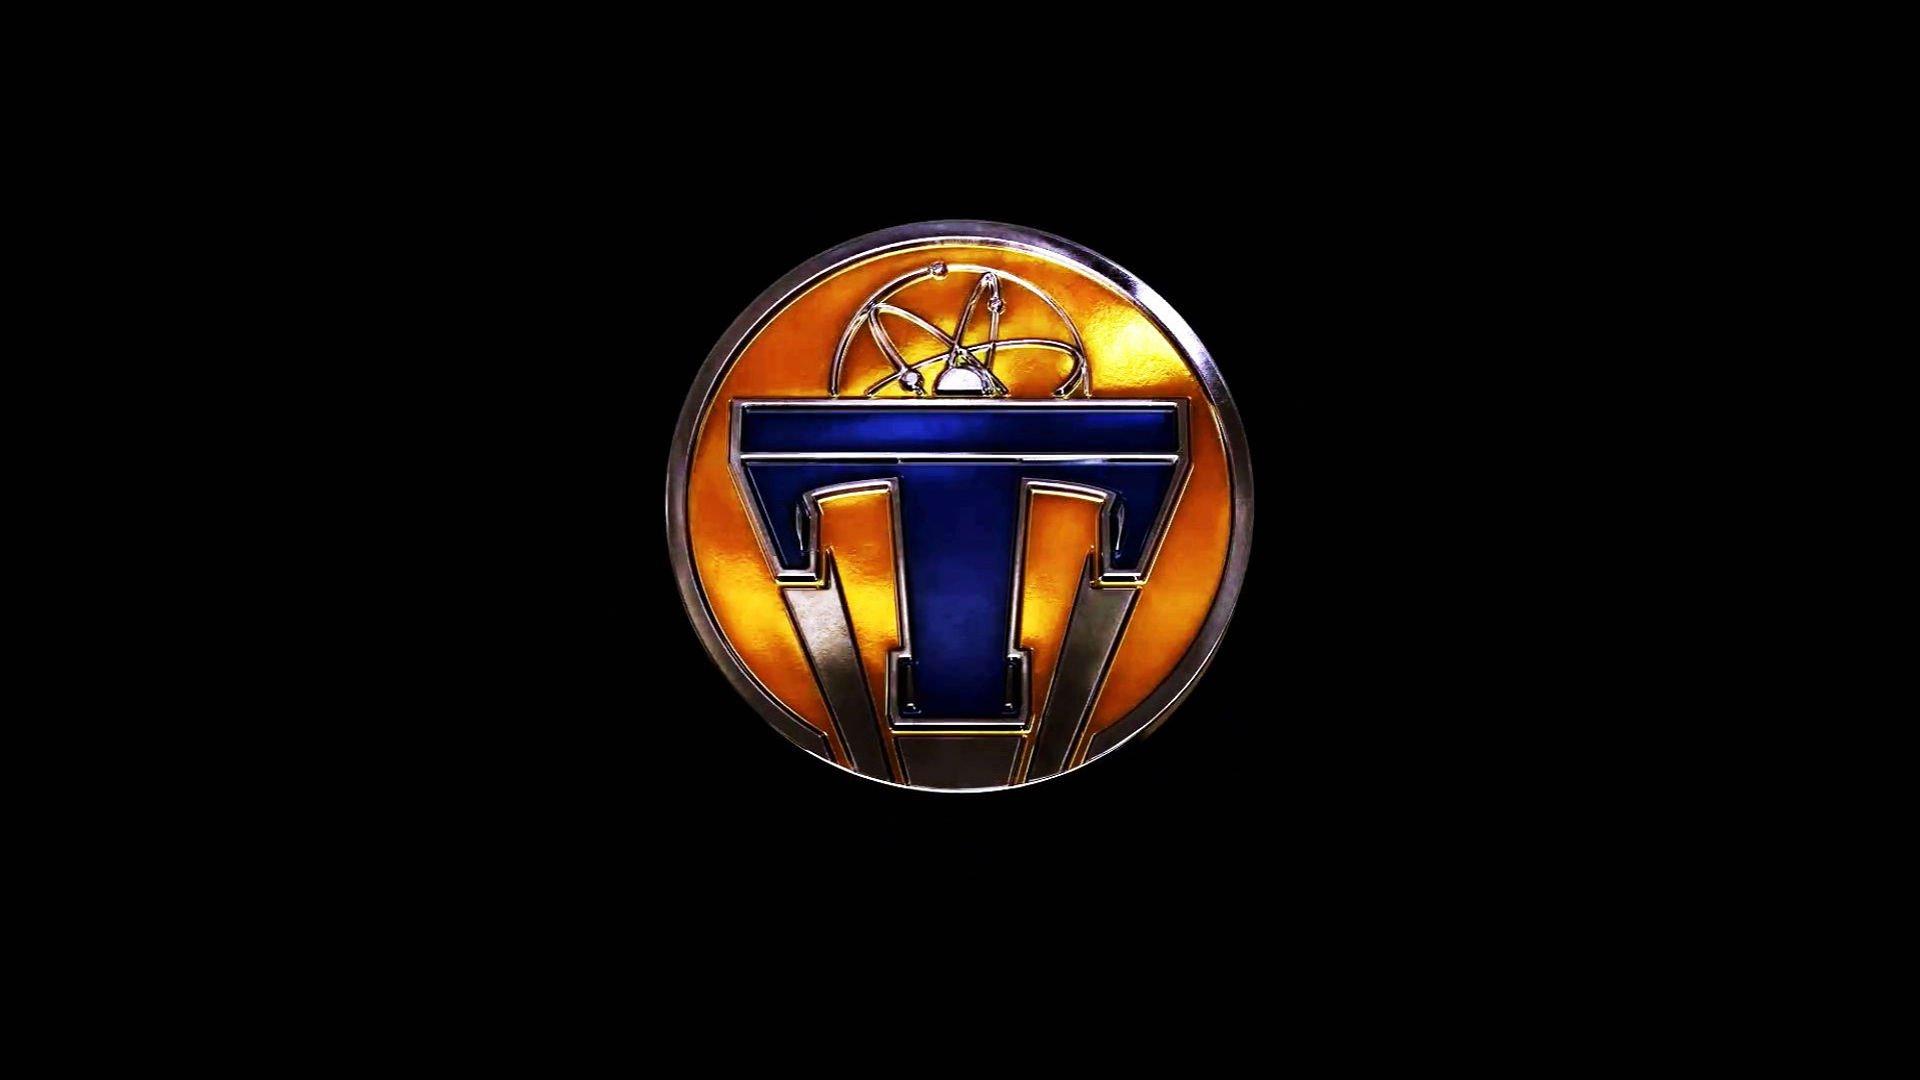 Movie Wallpapers Tomorrowland Movie desktop hd wallpaper Download